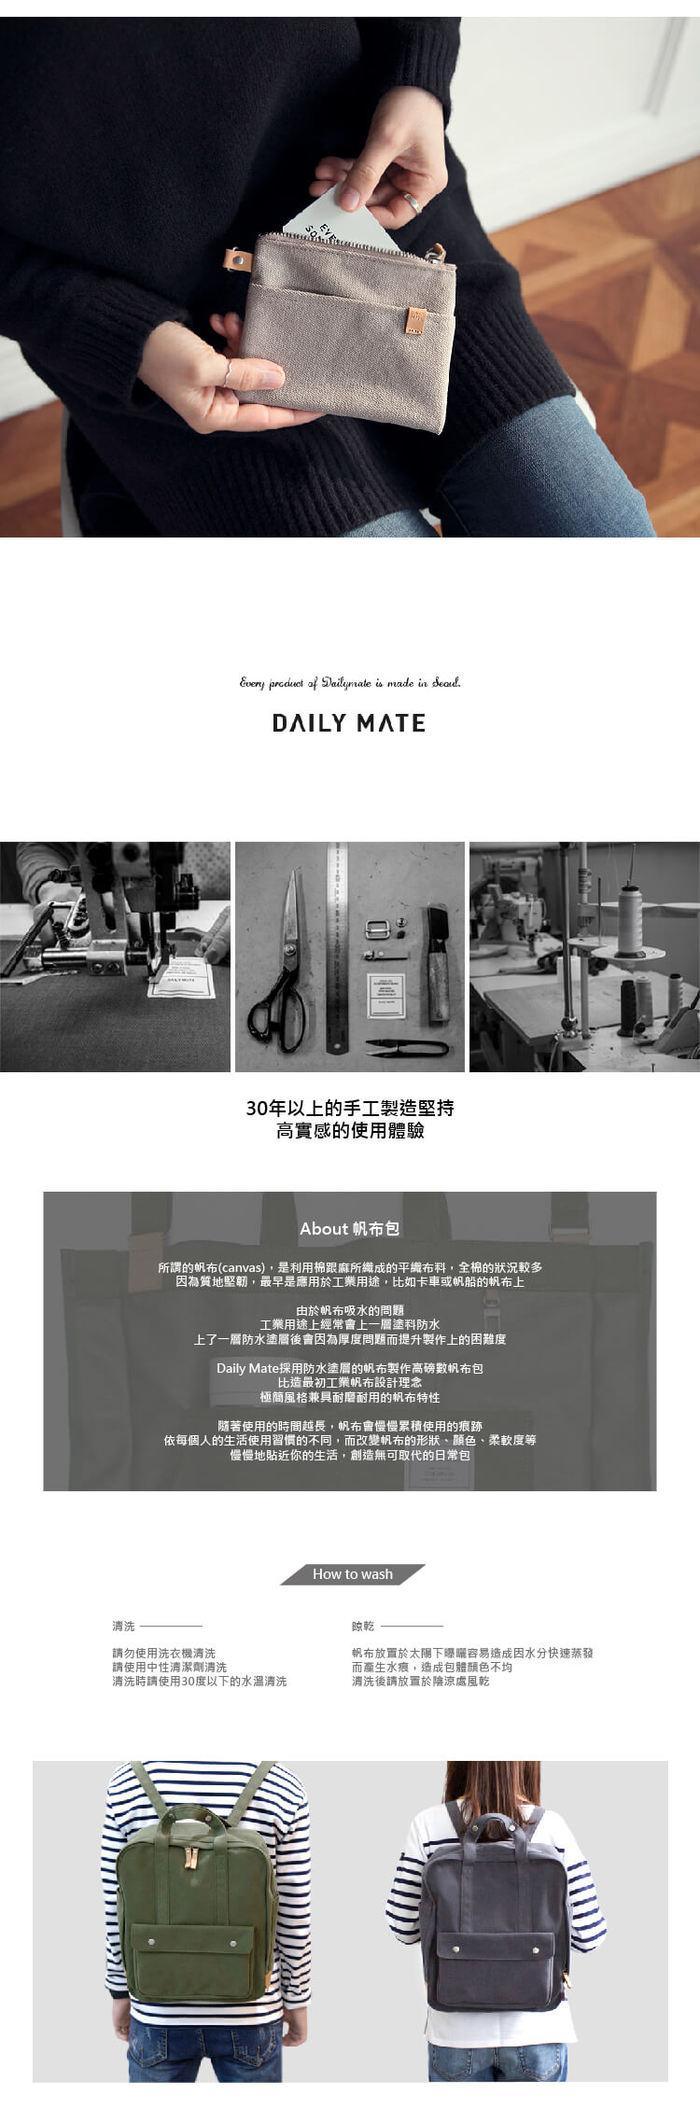 Daily mate|萬用收納袋S(米色)